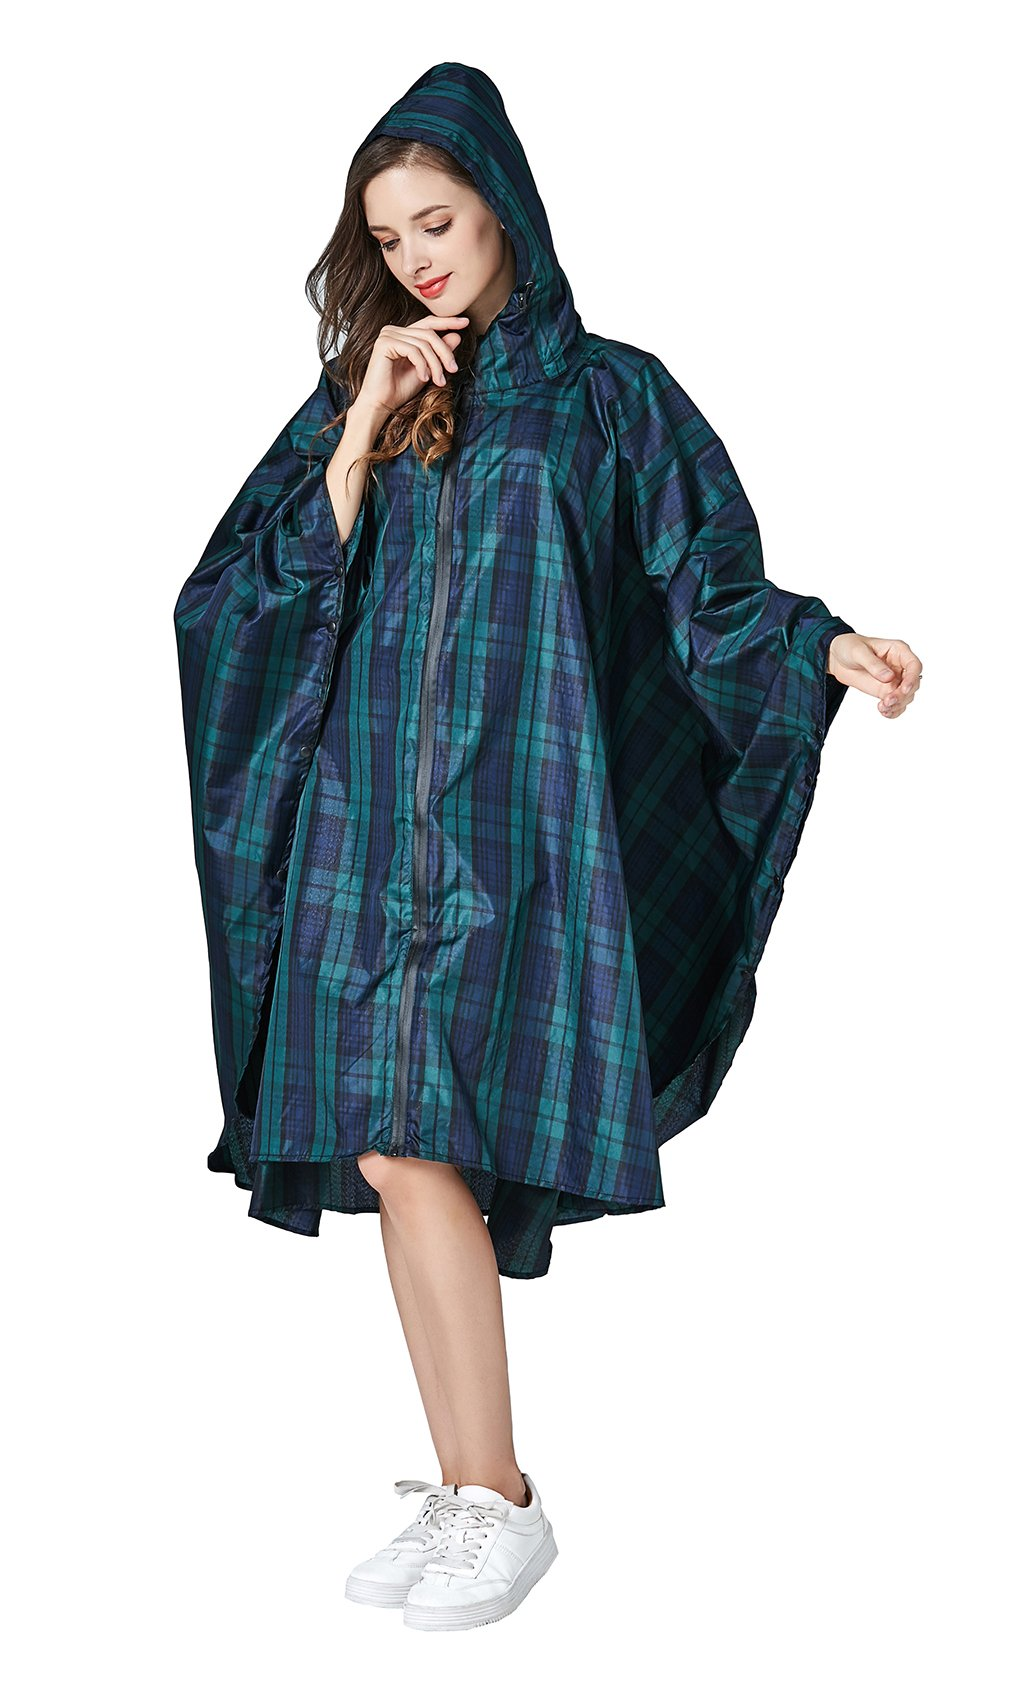 Women's Stylish Waterproof Rain Poncho Coloful Floral Print Raincoat with Hood and Zipper (Green Plaid, One Size)